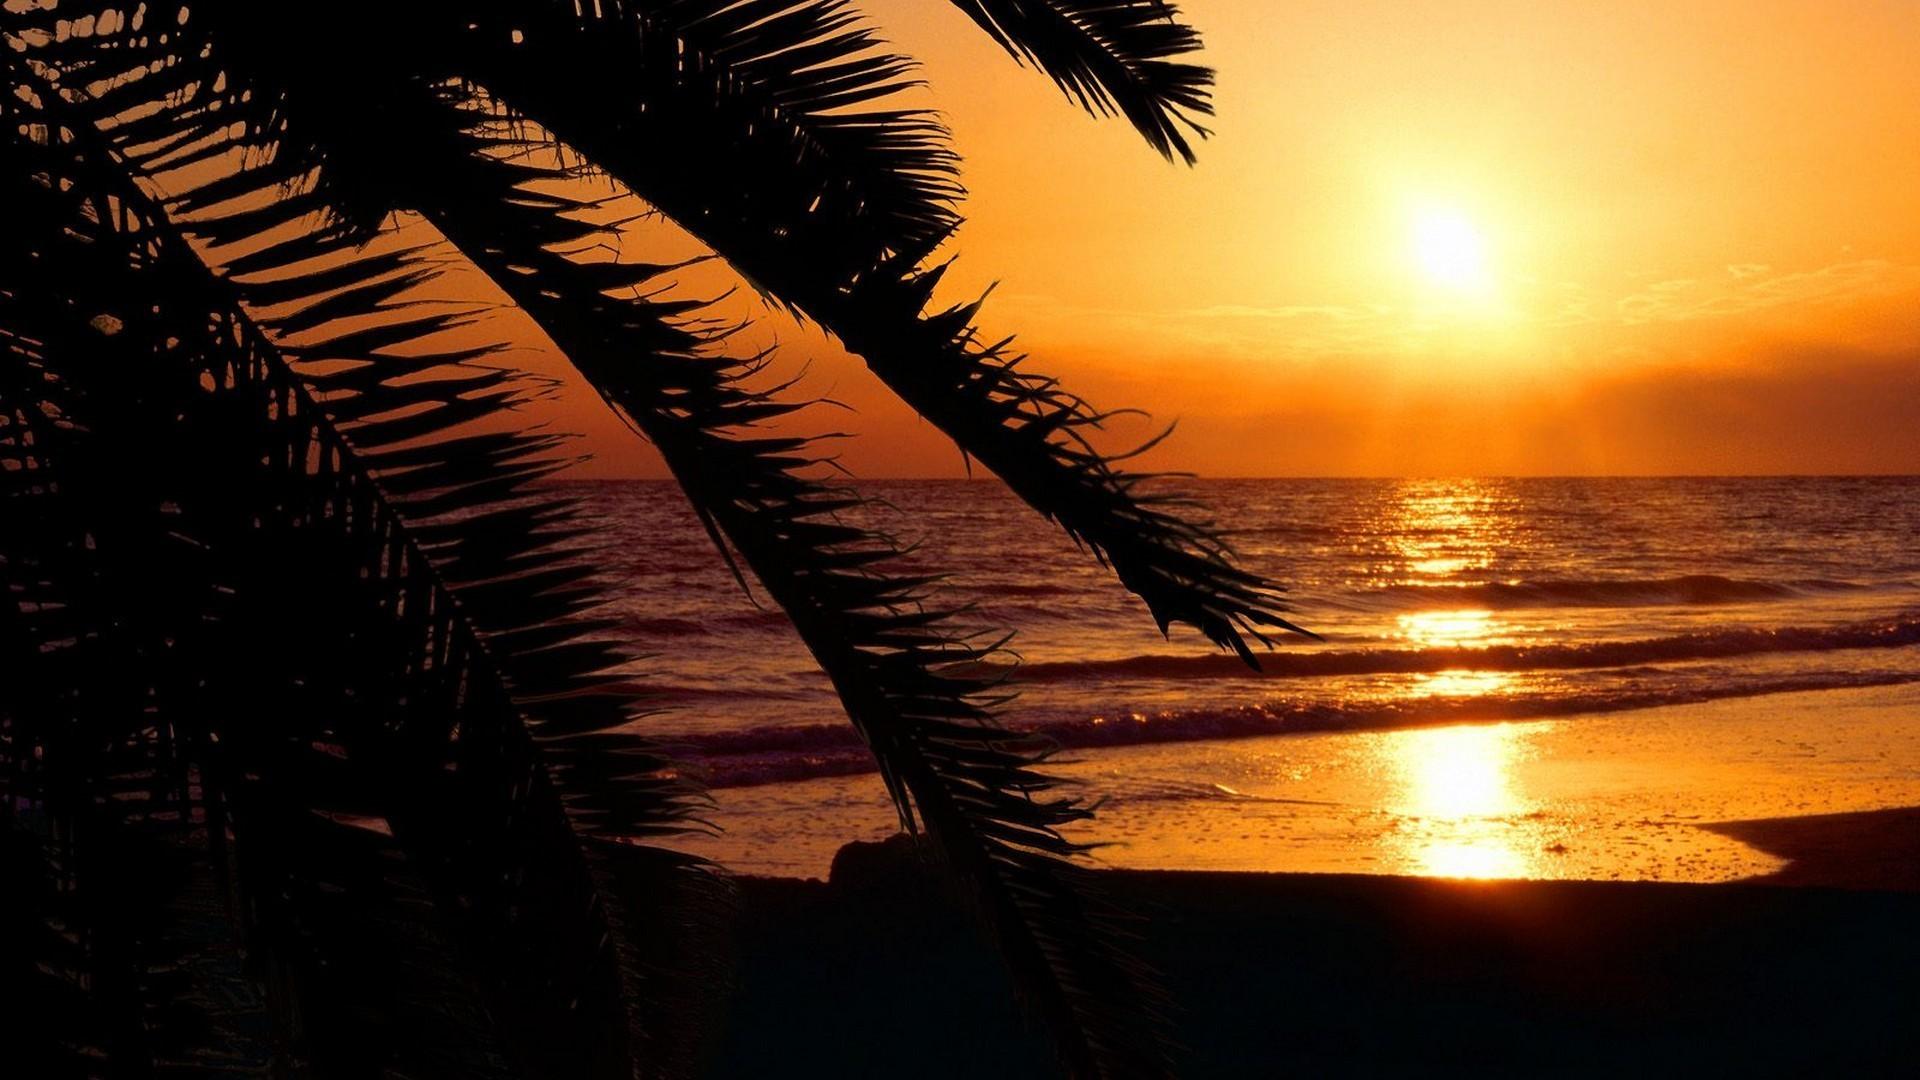 Florida beaches palm trees silhouettes sunset wallpaper AllWallpaper 1920x1080